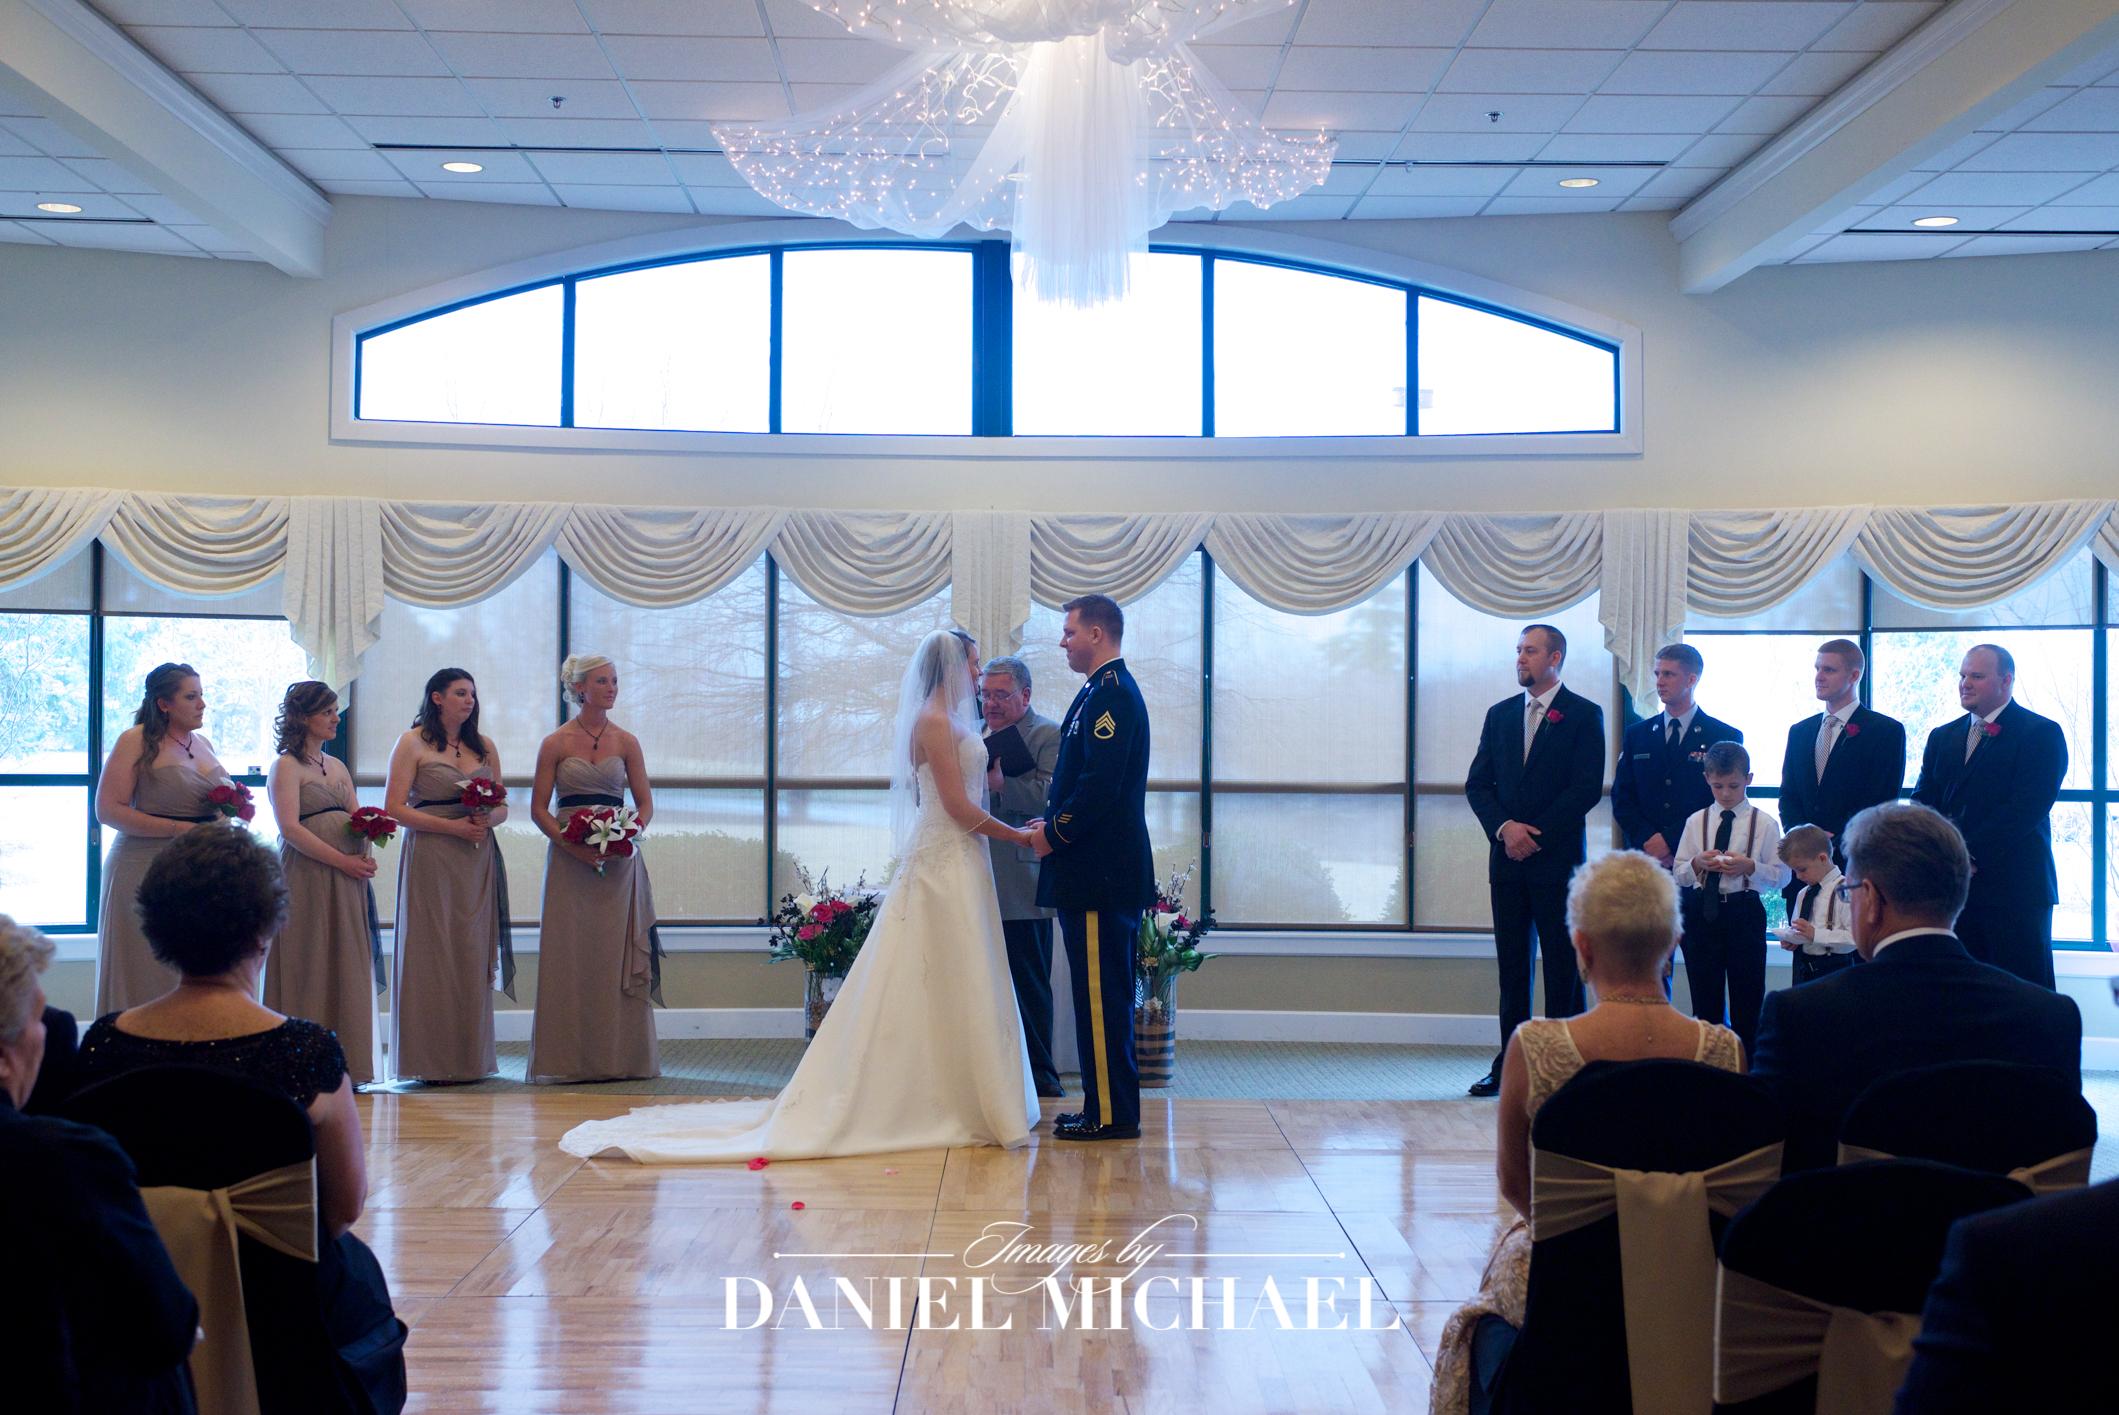 Beavercreek Golf Venue Wedding Reception Ceremony Photographer